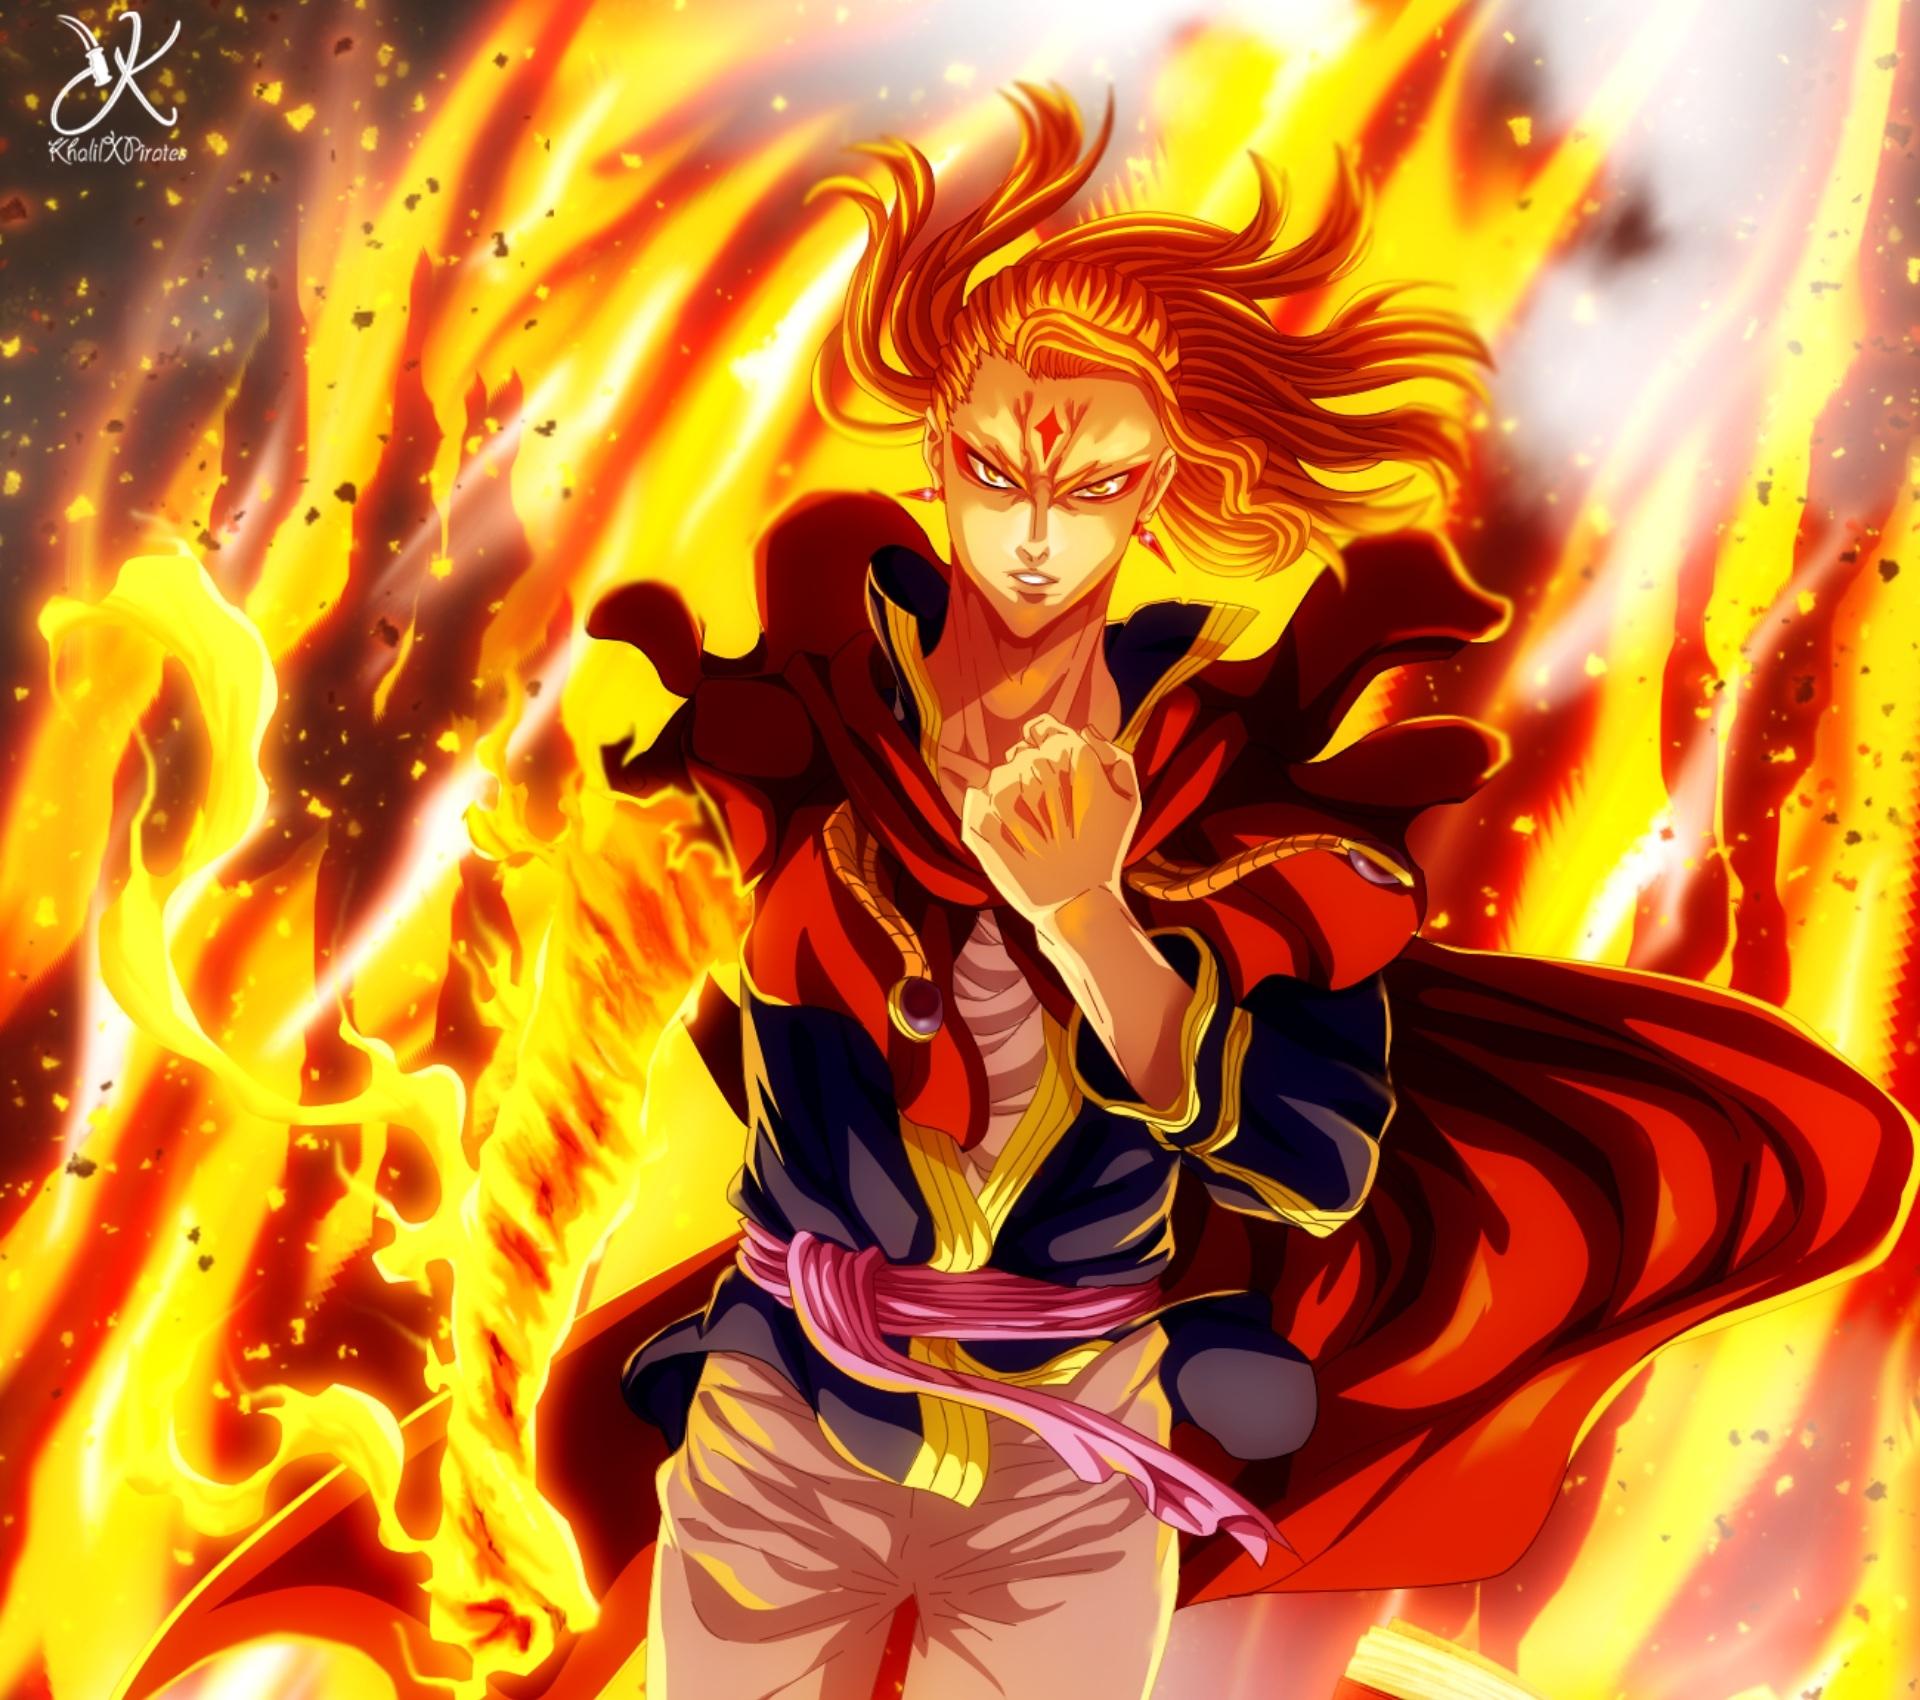 Fuegoleon Vermillion Art Wallpaper, HD Anime 4K Wallpapers ...